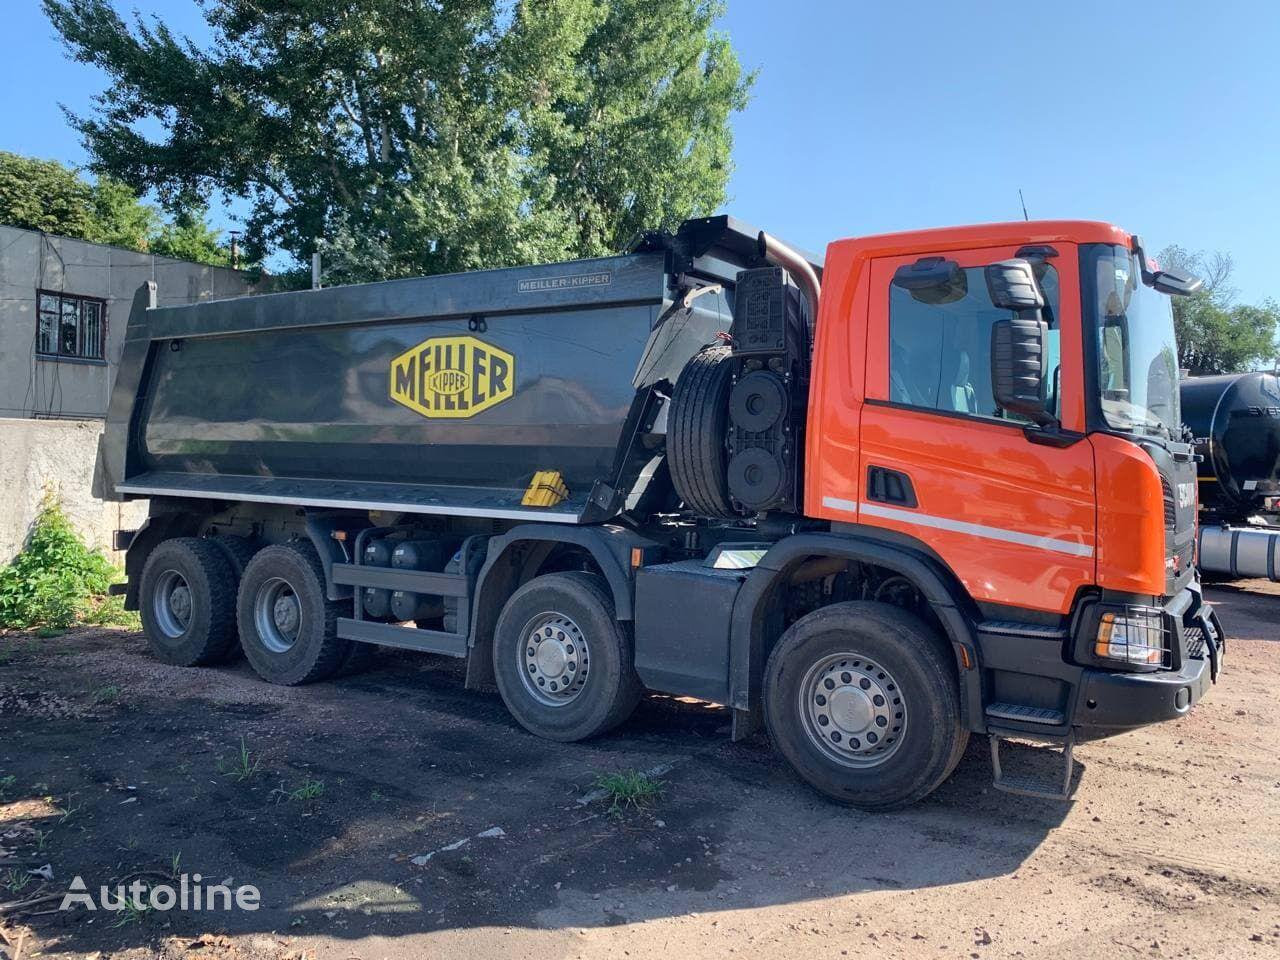 SCANIA P440 dump truck